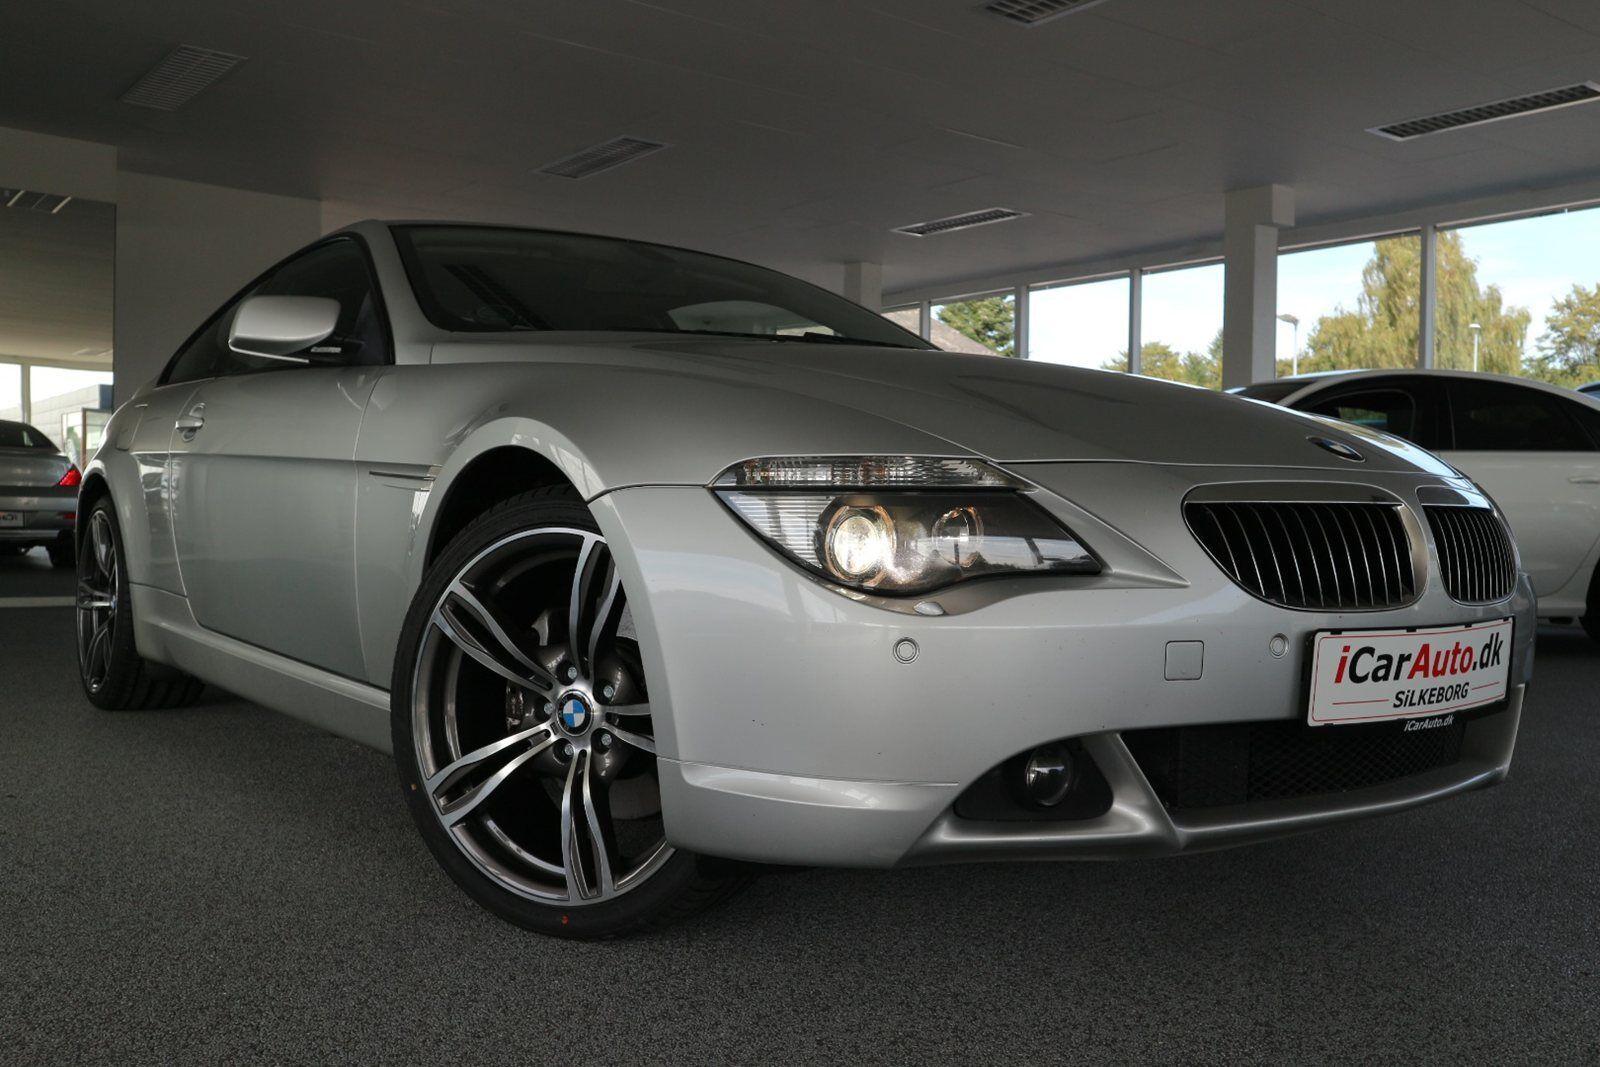 BMW 645Ci 4,4 Coupé Steptr. 2d - 239.900 kr.